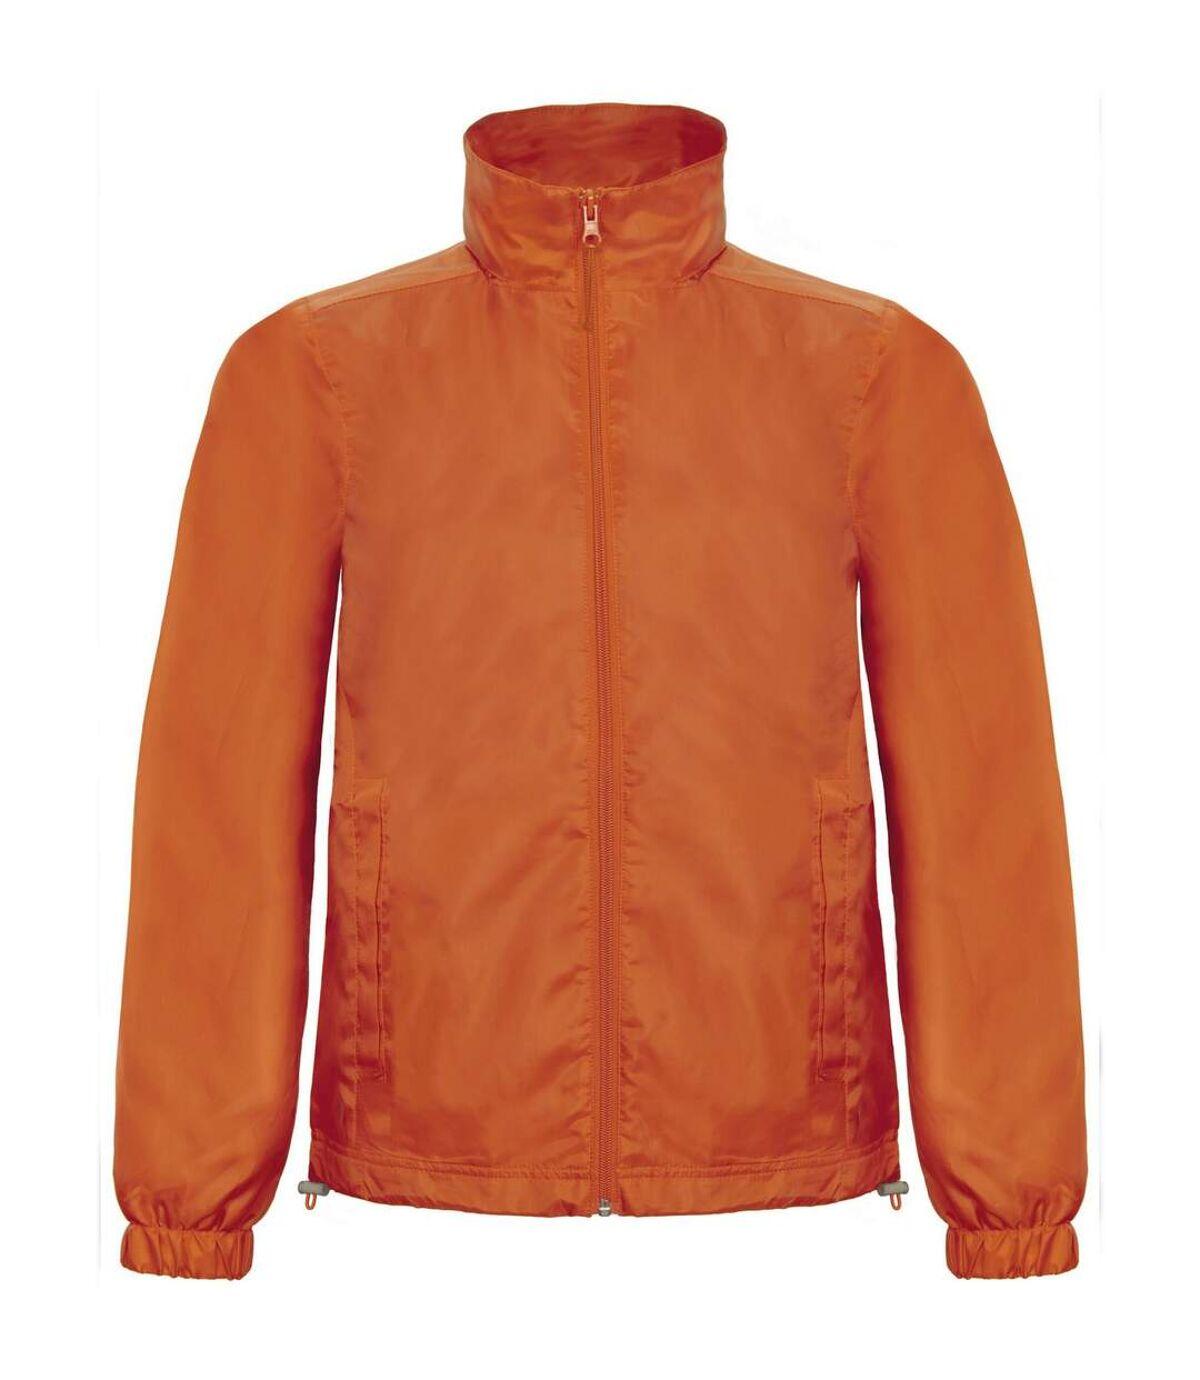 B&C Mens ID.601 Hooded Showerproof Windbreaker Jacket (Orange) - UTRW3524